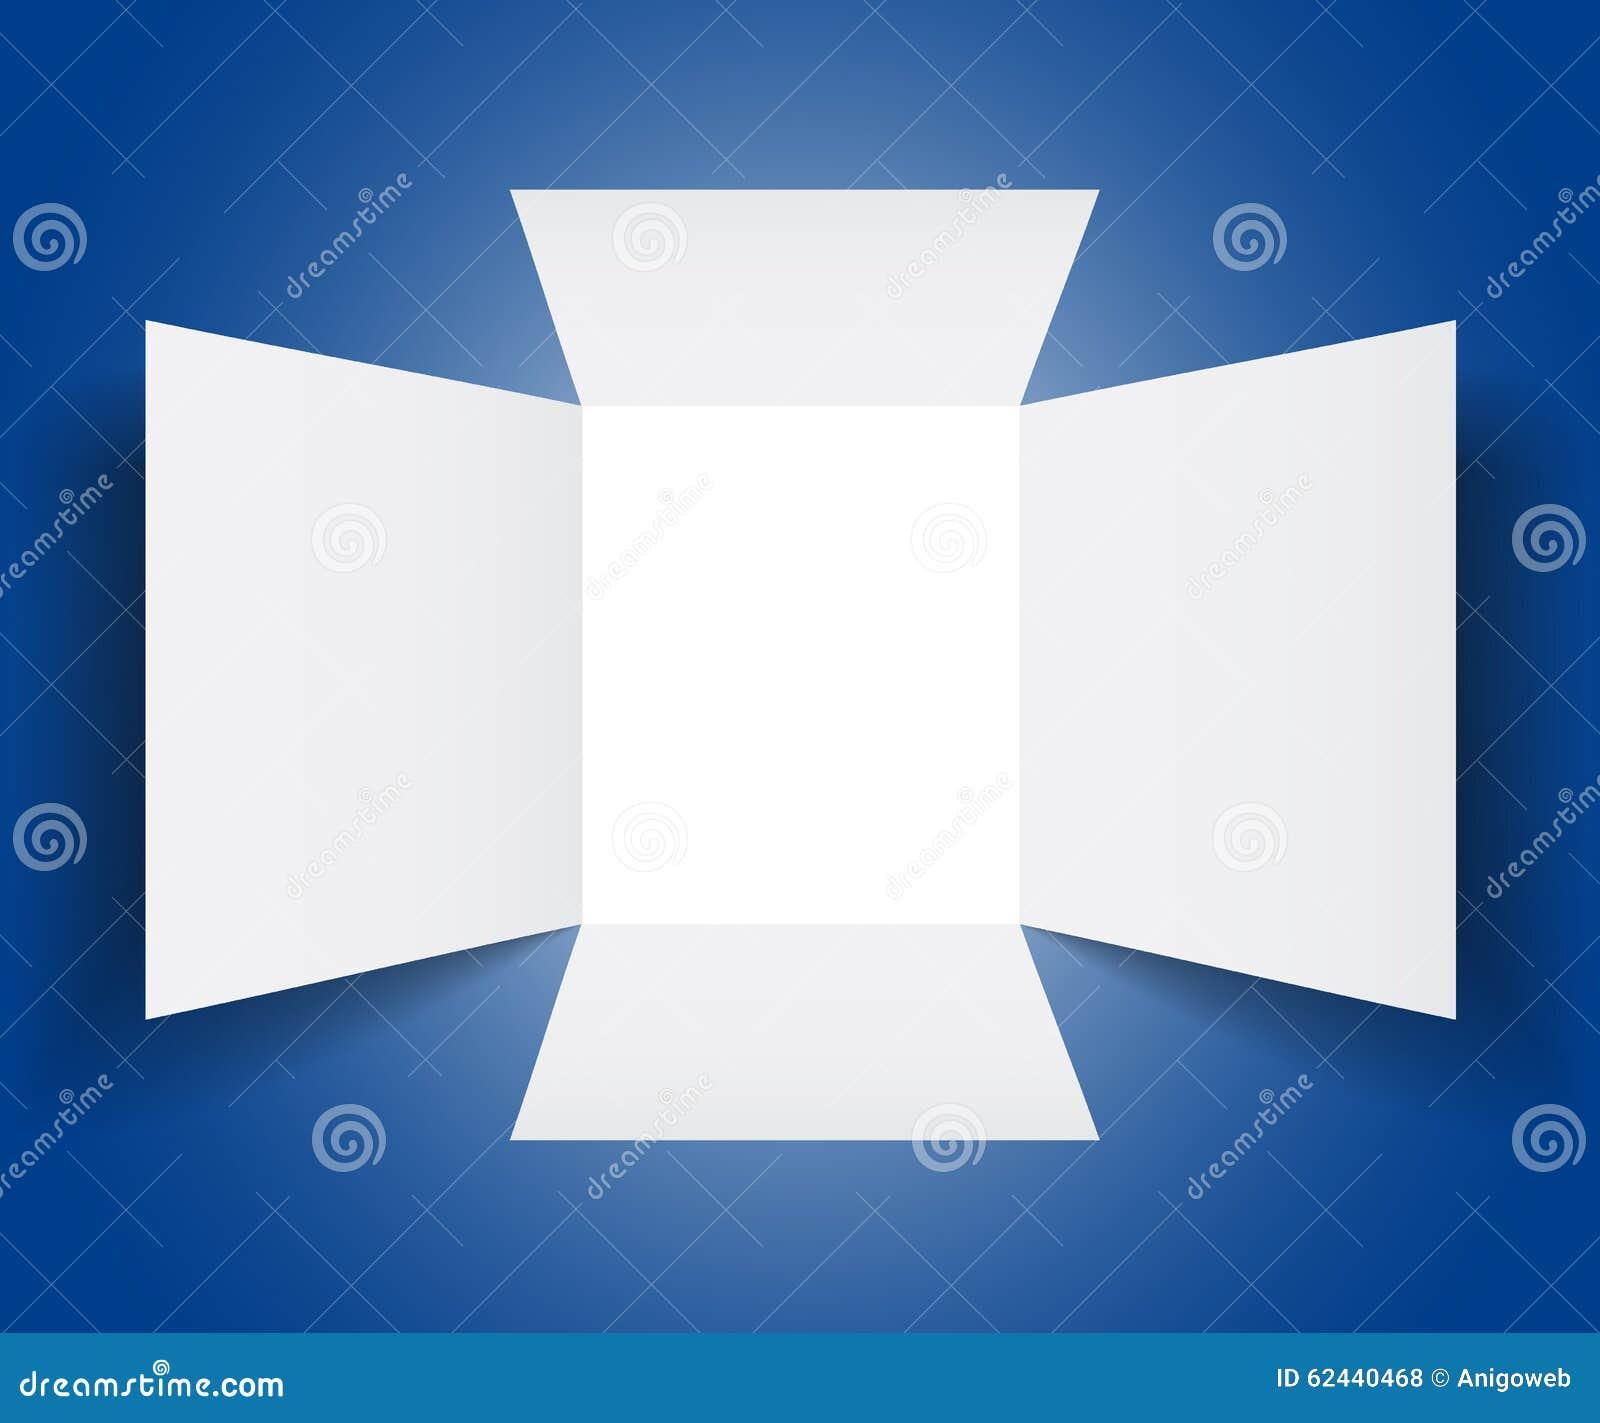 vector open box template stock illustration image 62440468. Black Bedroom Furniture Sets. Home Design Ideas